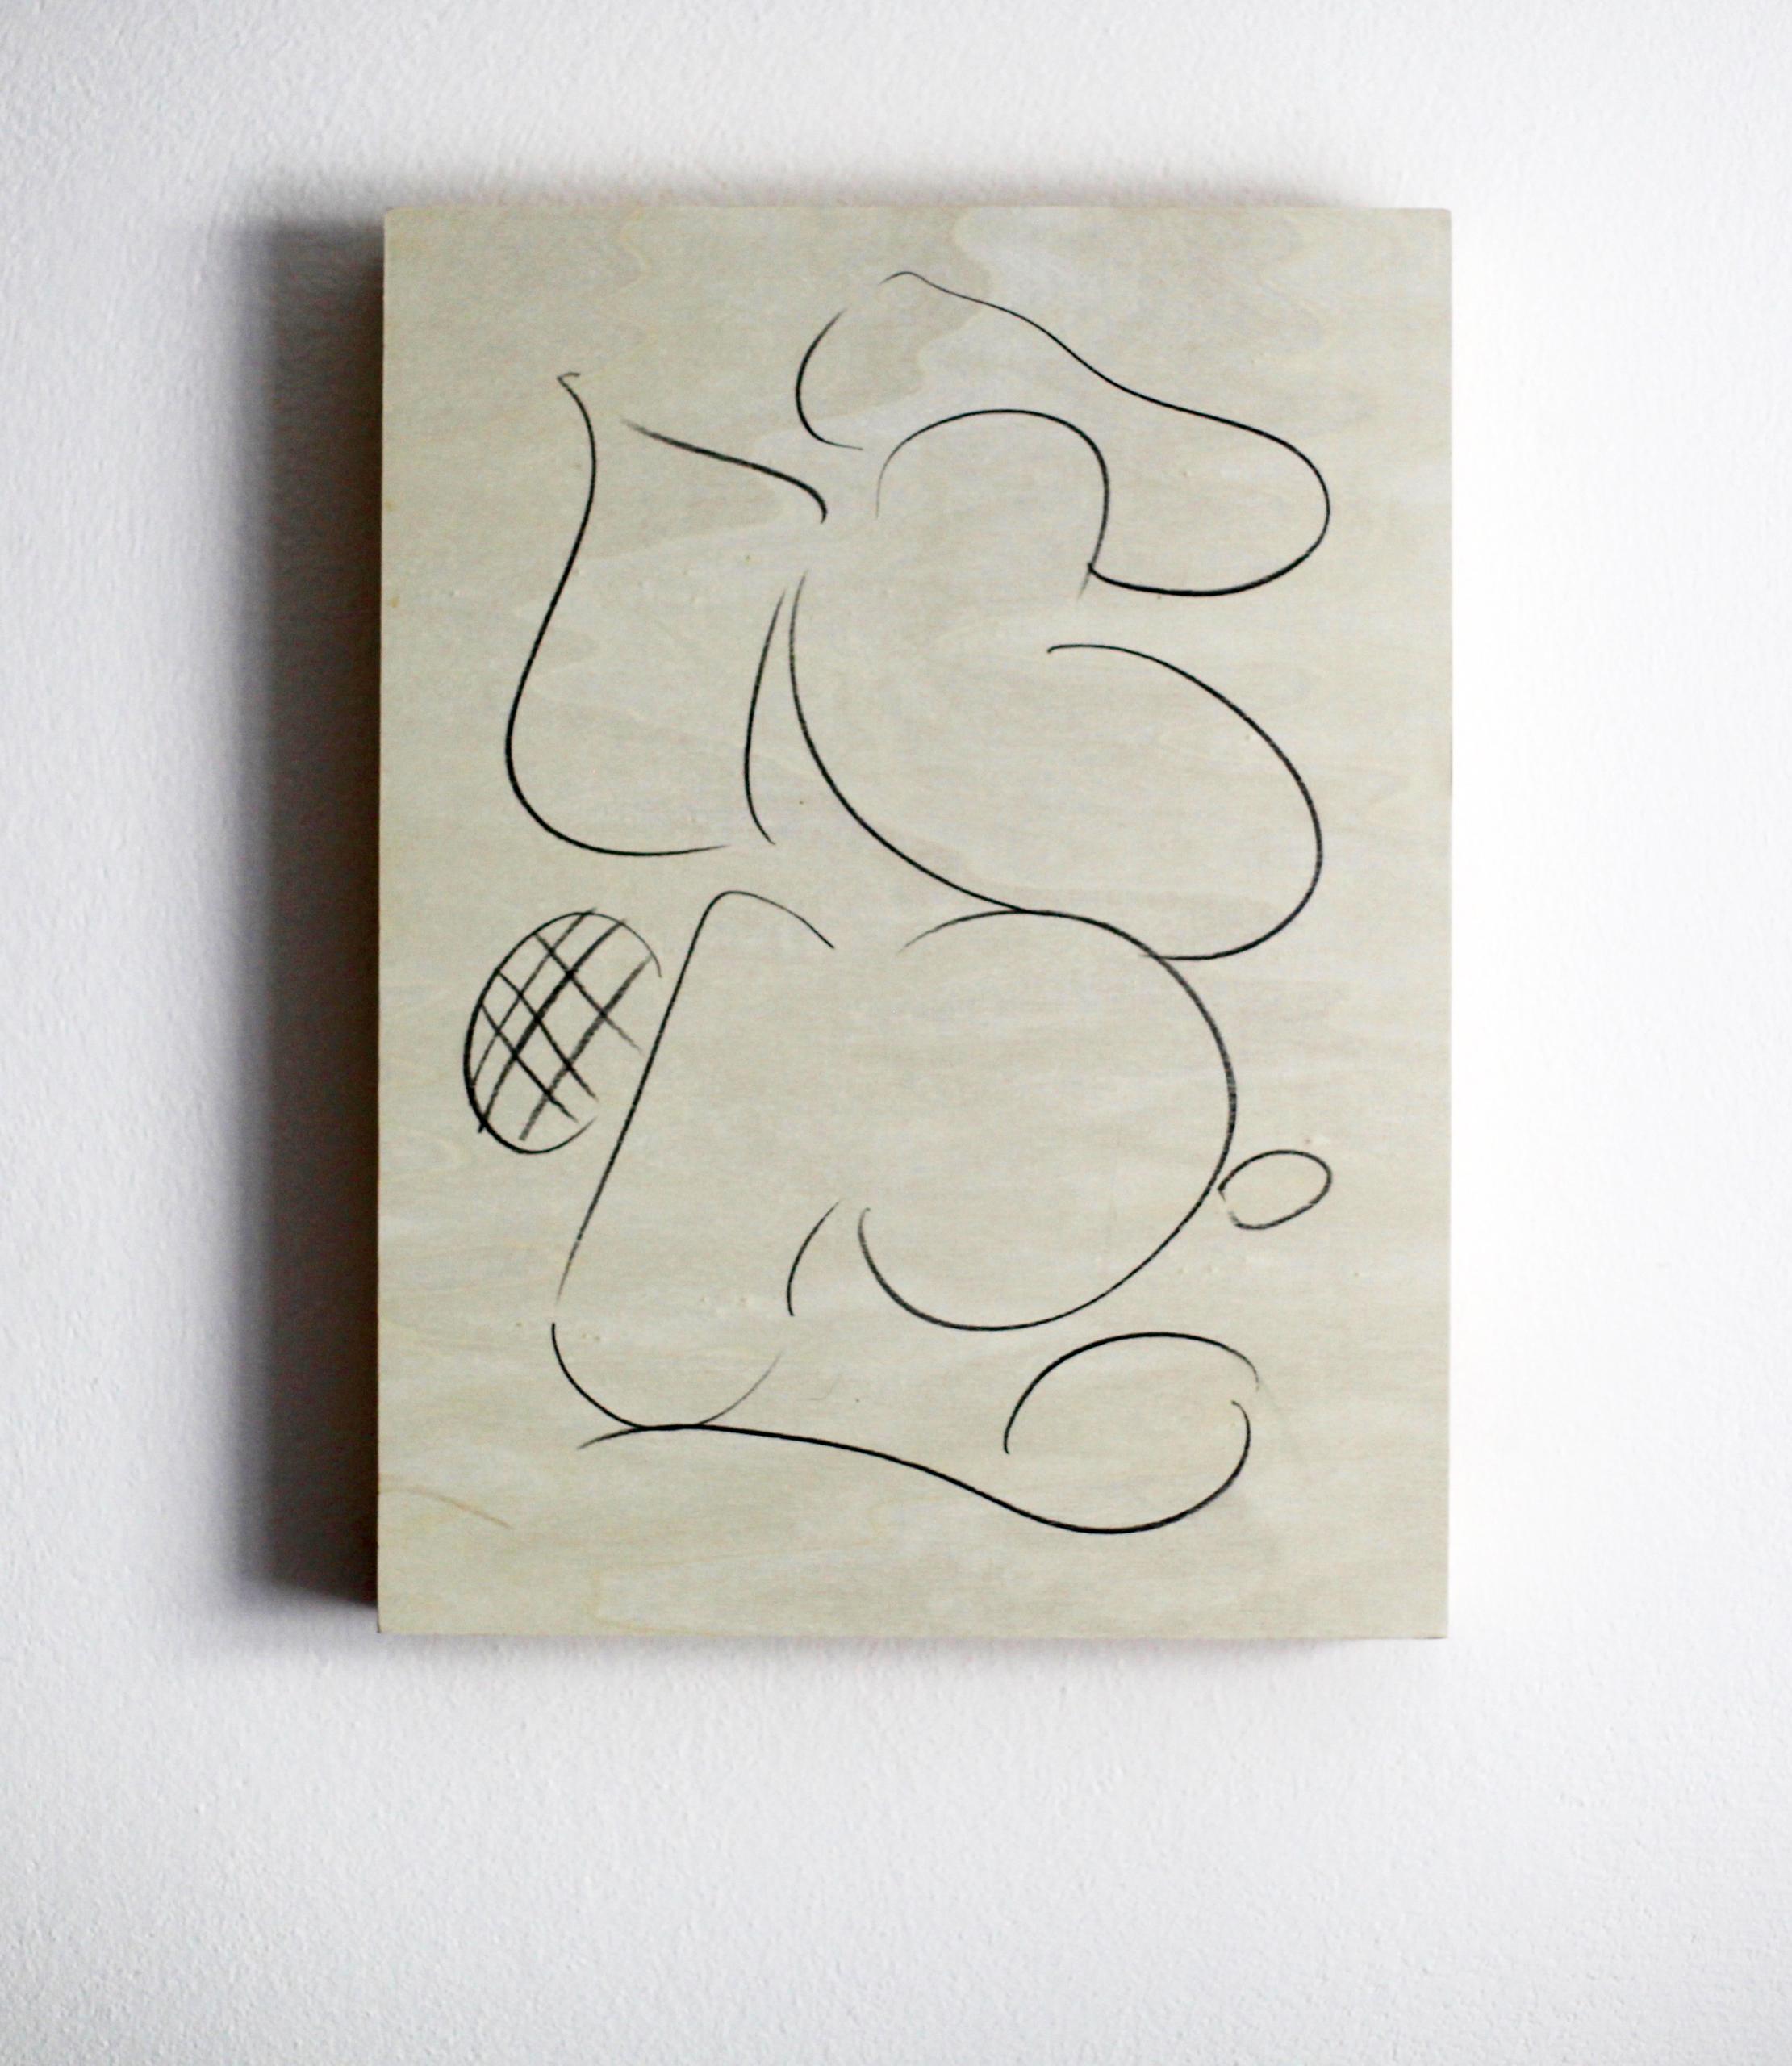 Edwin Burdis, L'Breast Raw, 2017. Pencil on plywood. 30.5 x 40.6 x 5.2 cm.